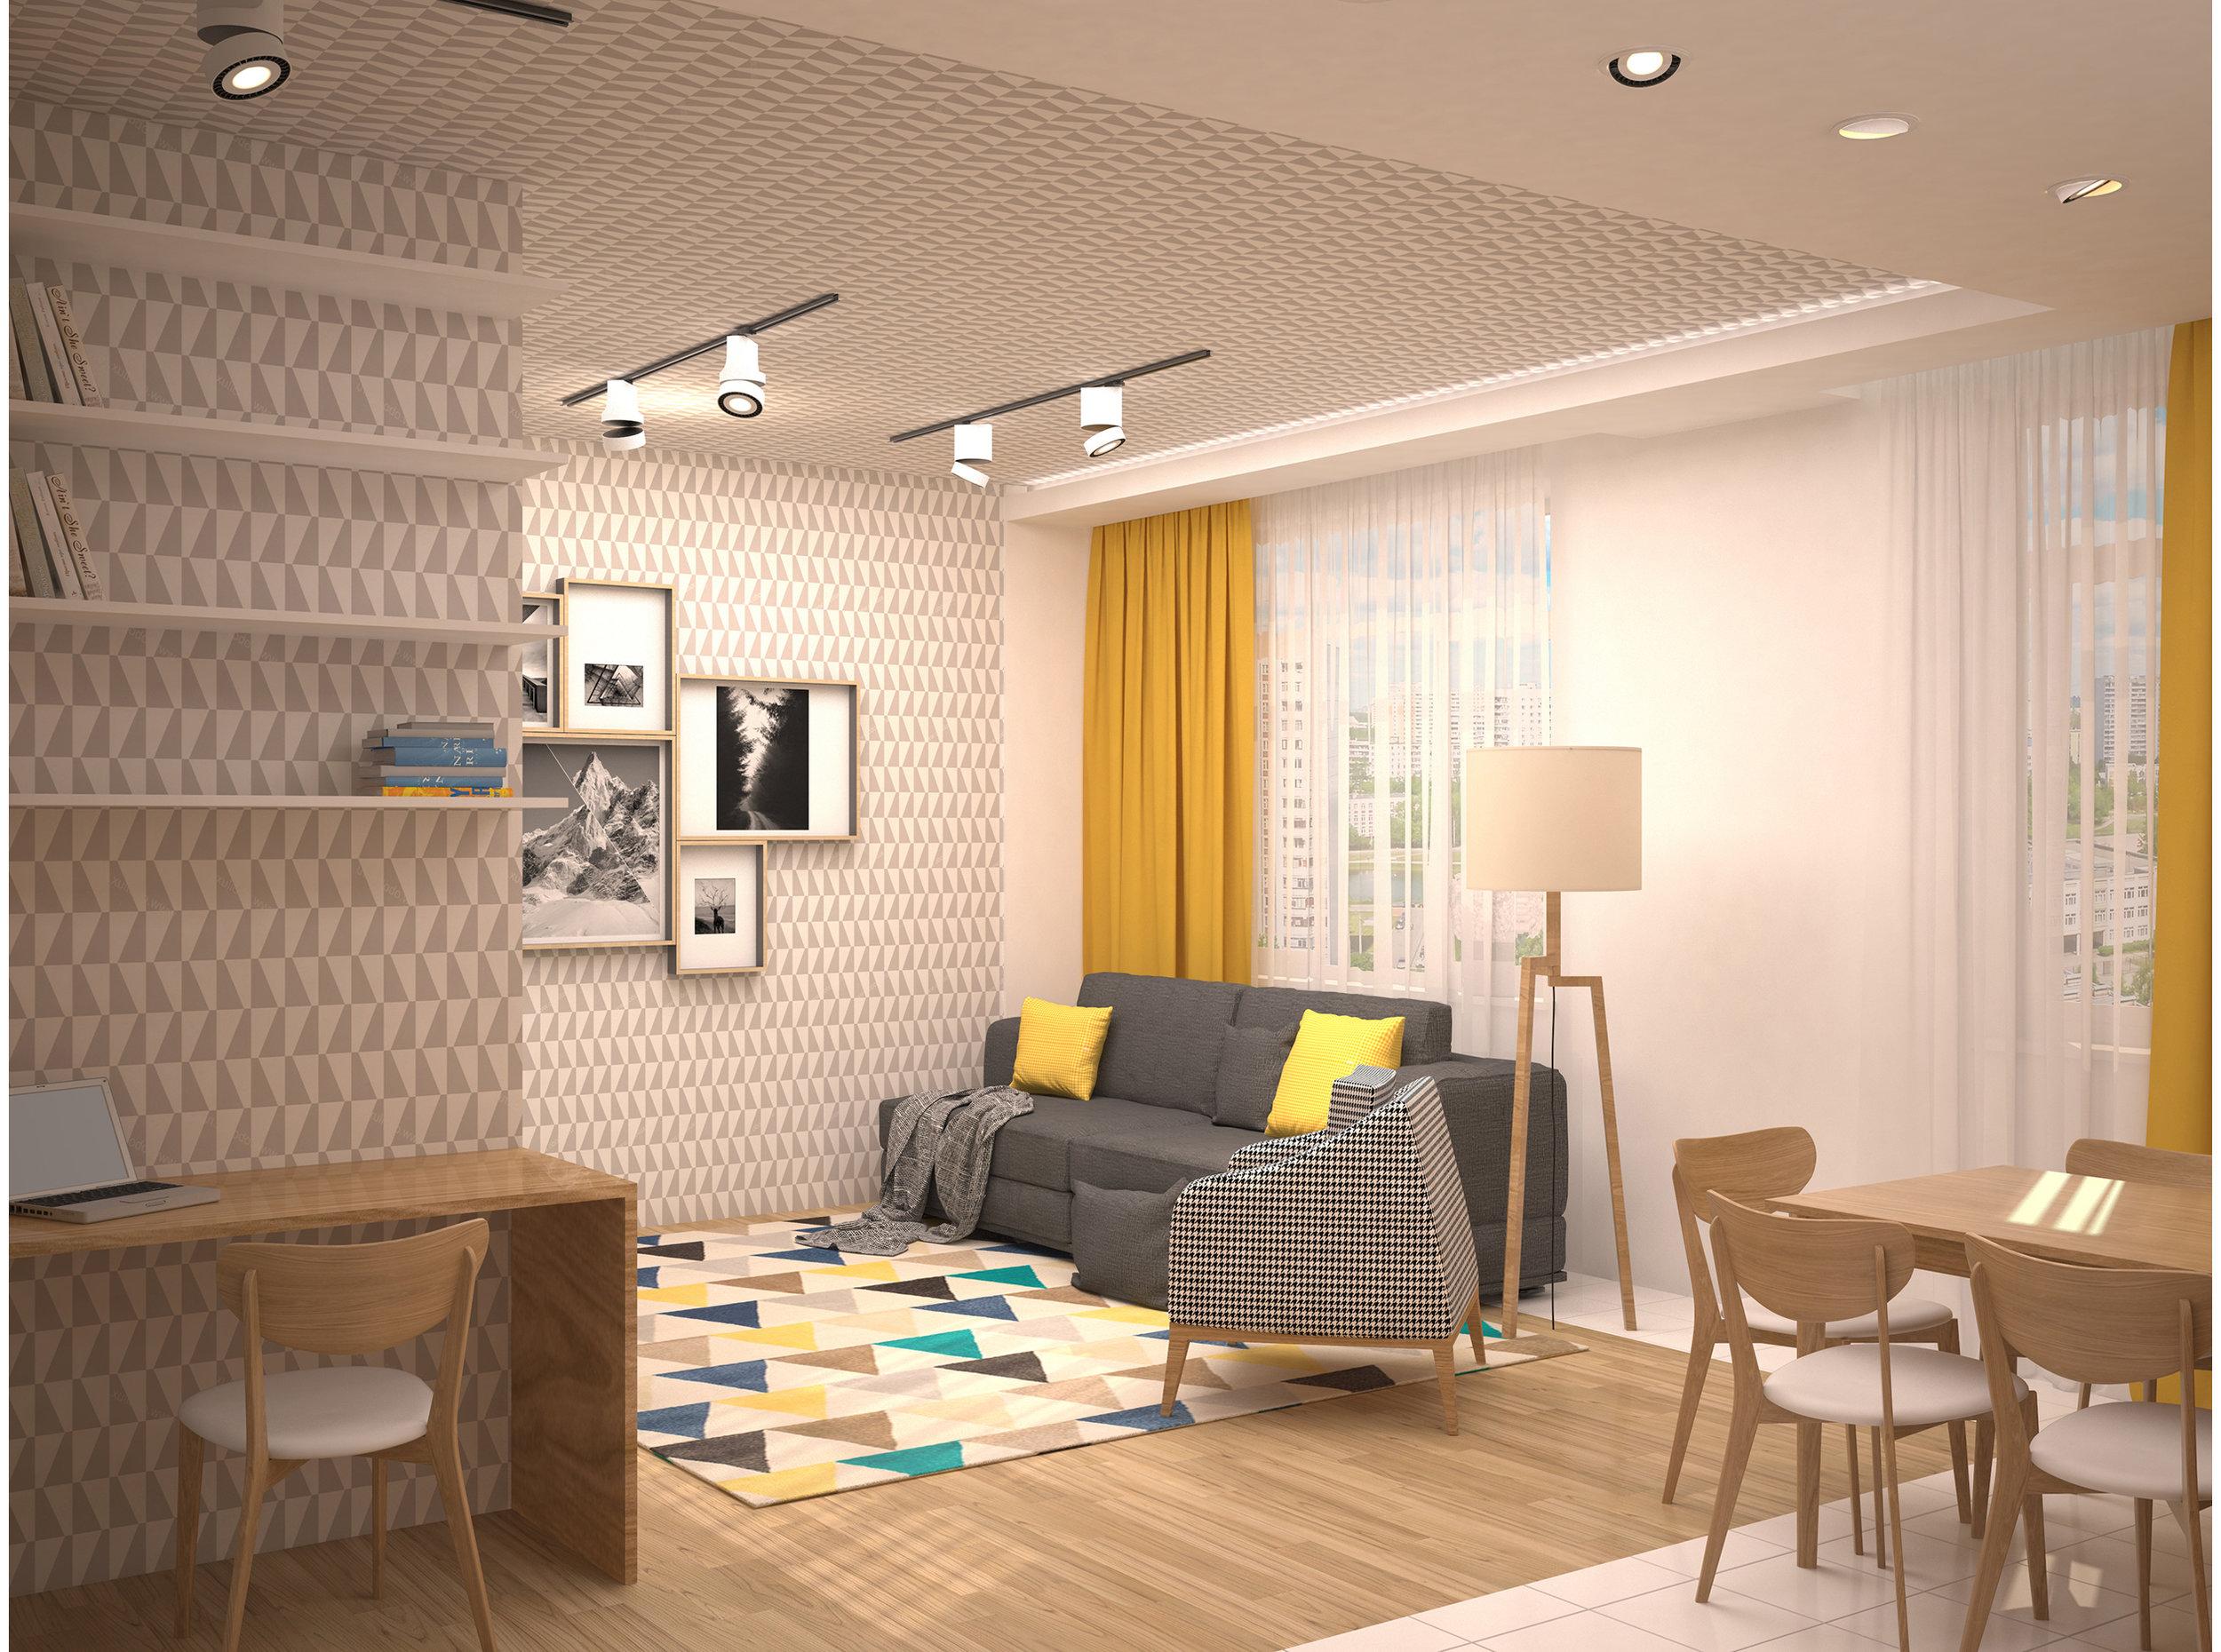 Copy of Scandinavian style living room interior